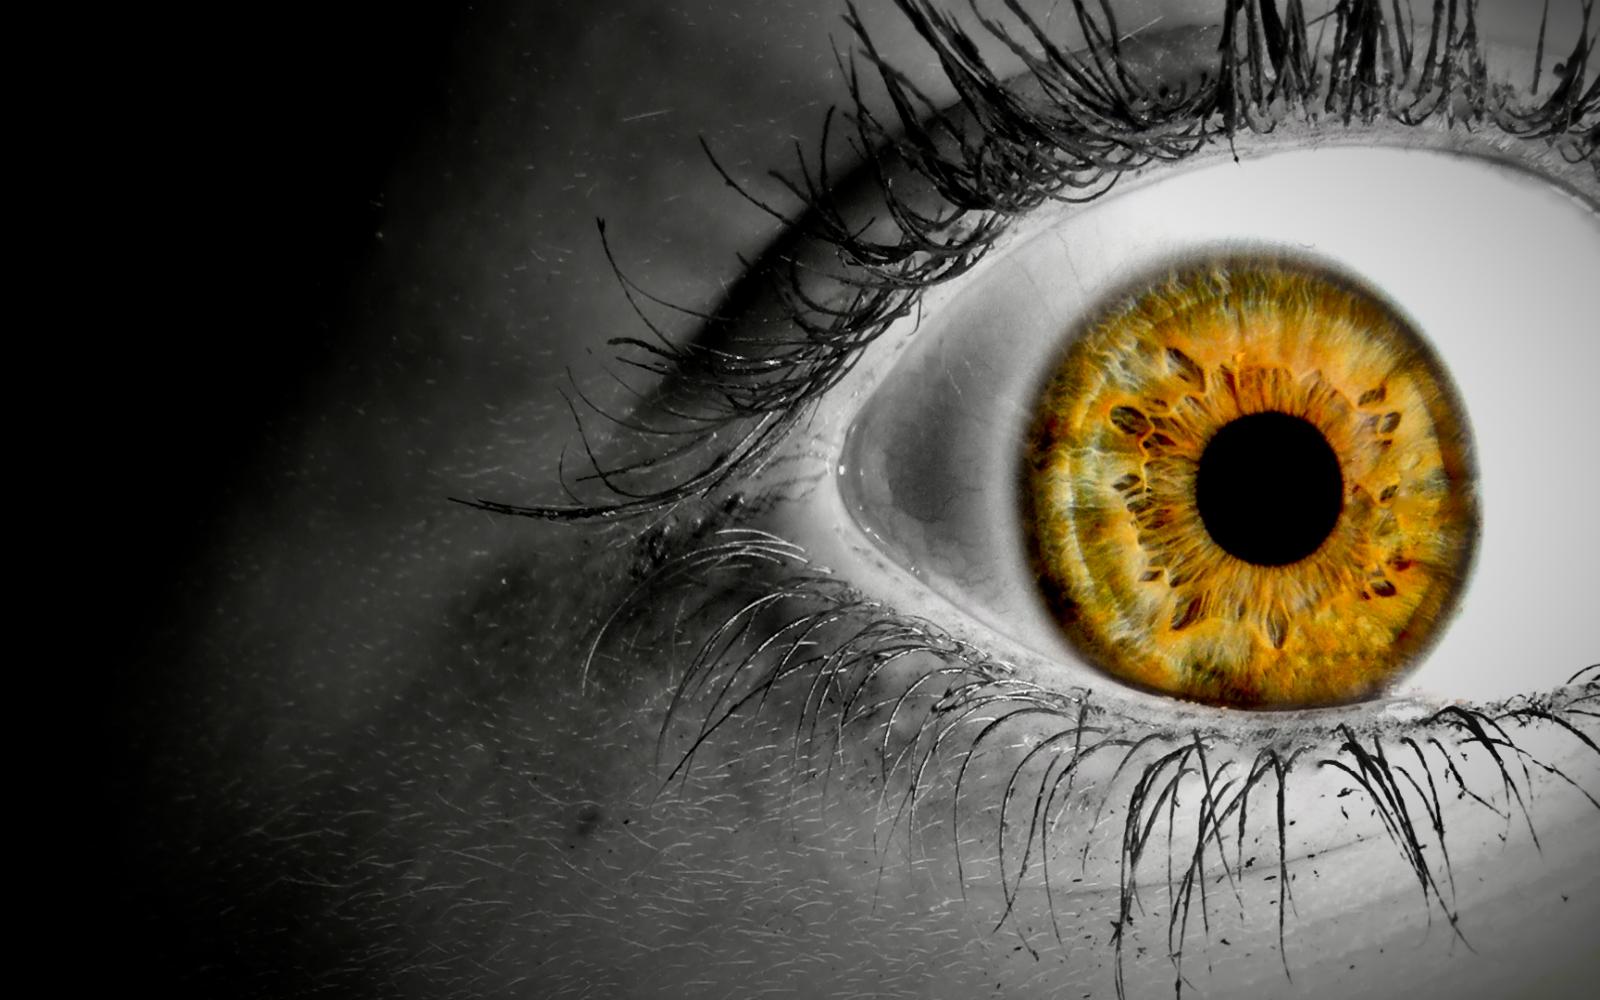 http://1.bp.blogspot.com/-yKFyJ0PA5Es/TmanEZ9A1aI/AAAAAAAAA04/vvx6oKiDTqs/s1600/selective_coloring_orange_eyes_www.Vvallpaper.net.jpg